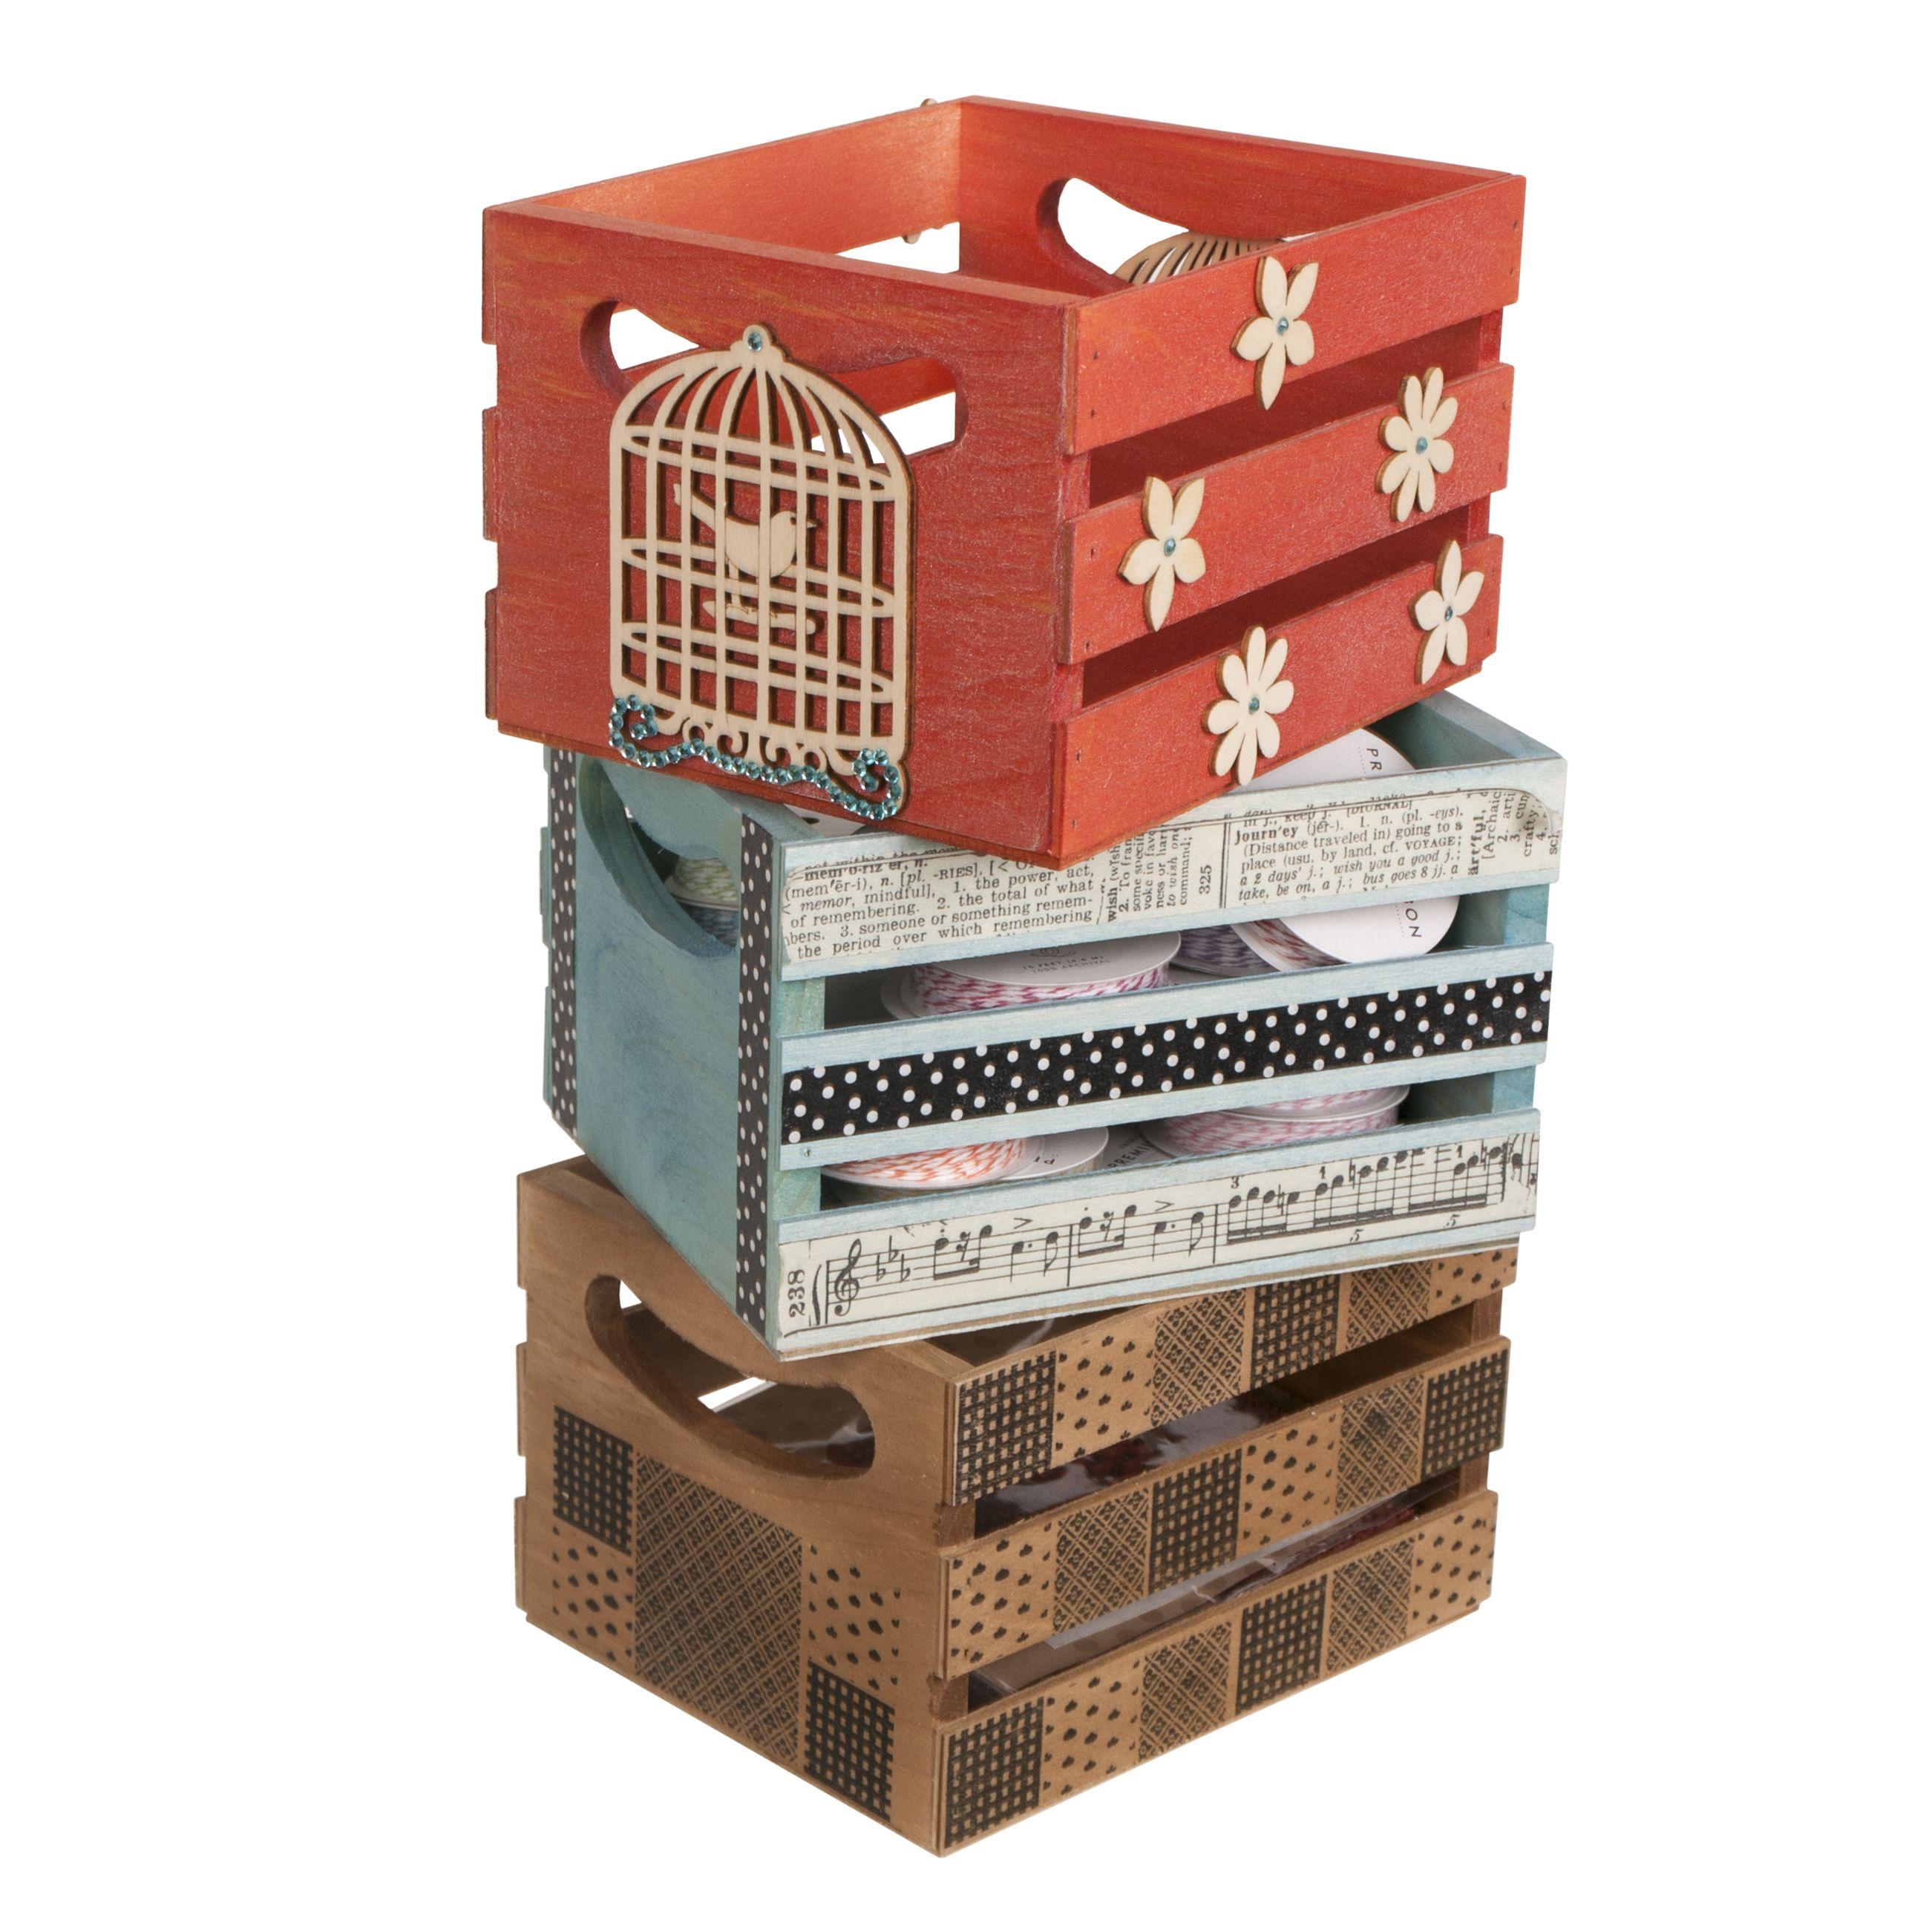 Mini Storage Crates Crate Storage Mini Crates Diy Wooden Crate